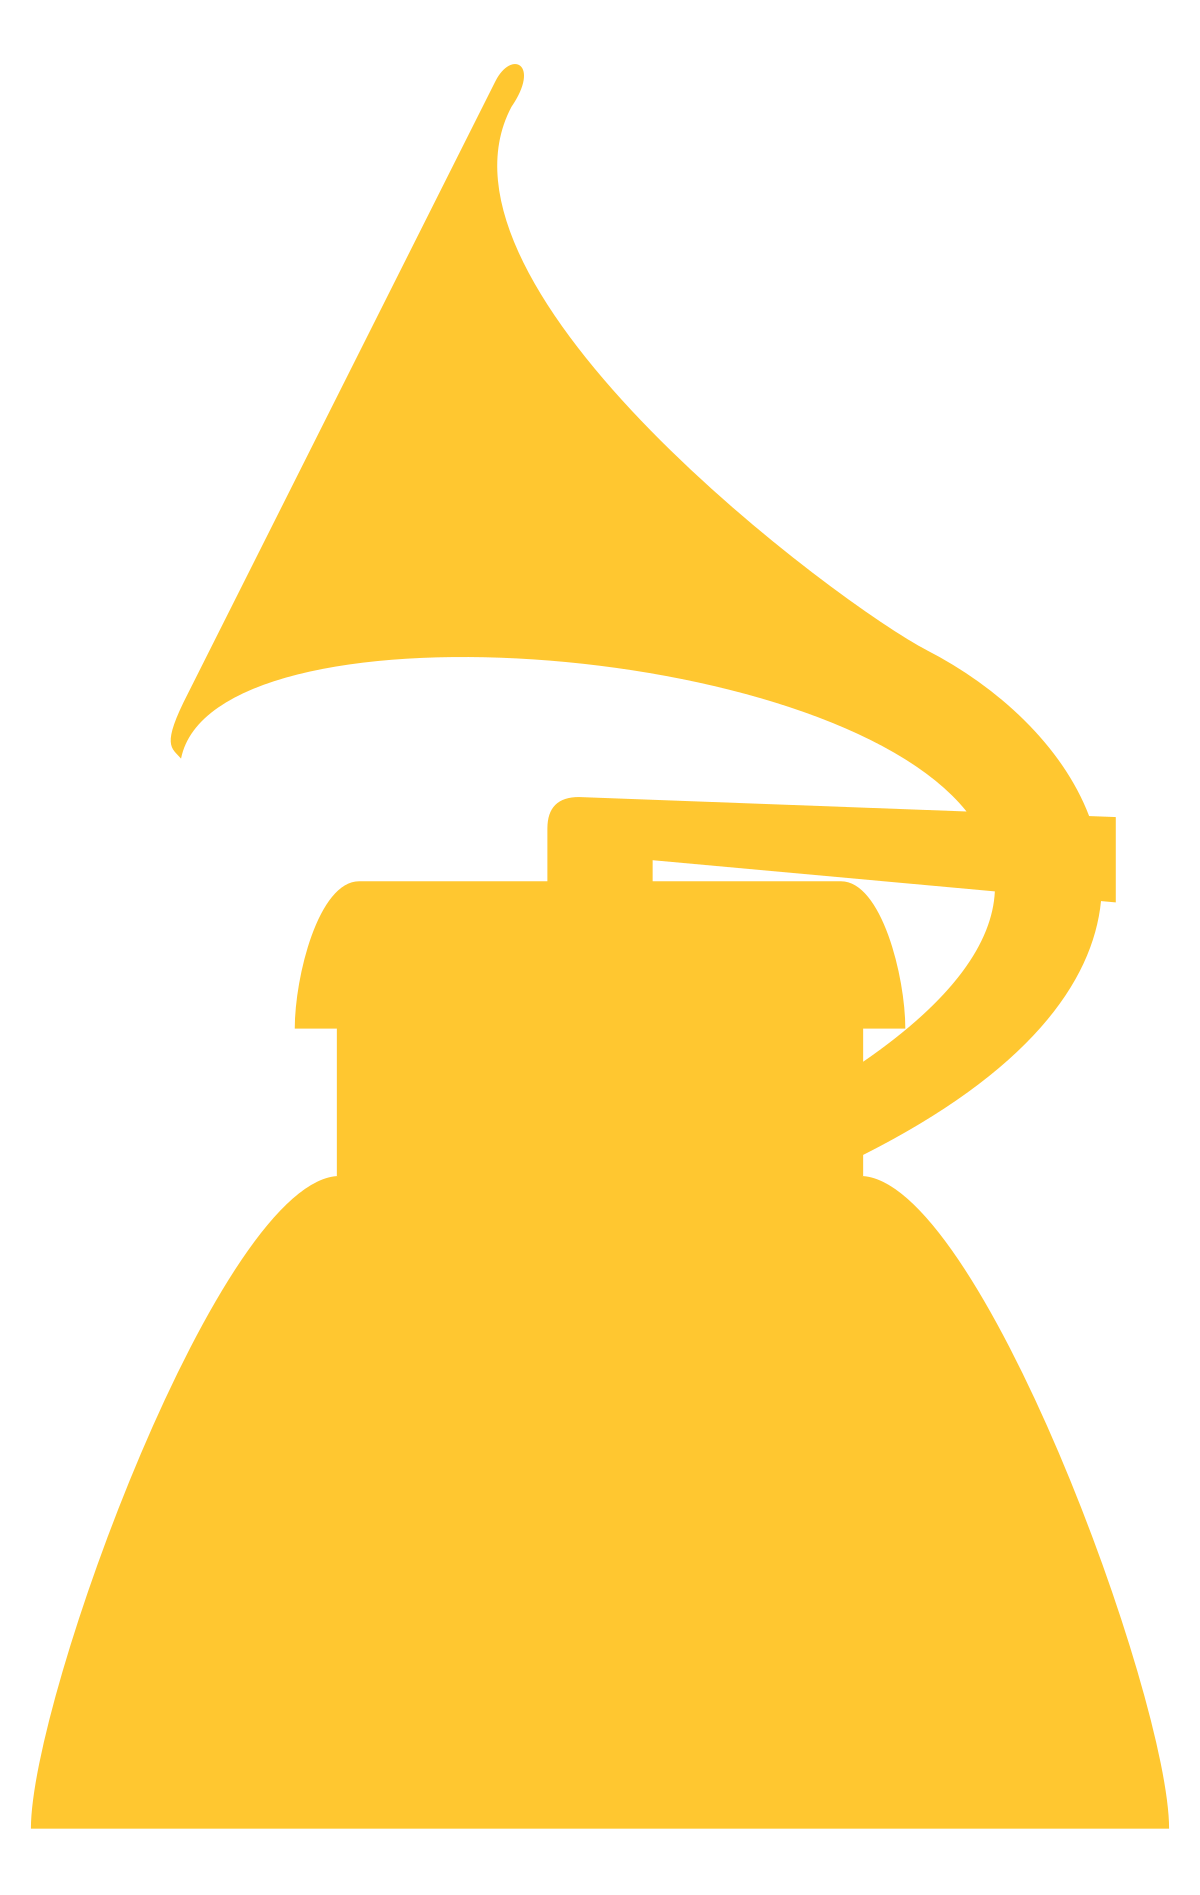 Falcon rising sun clipart banner freeuse download Cena Grammy za album roka – Wikipédia banner freeuse download